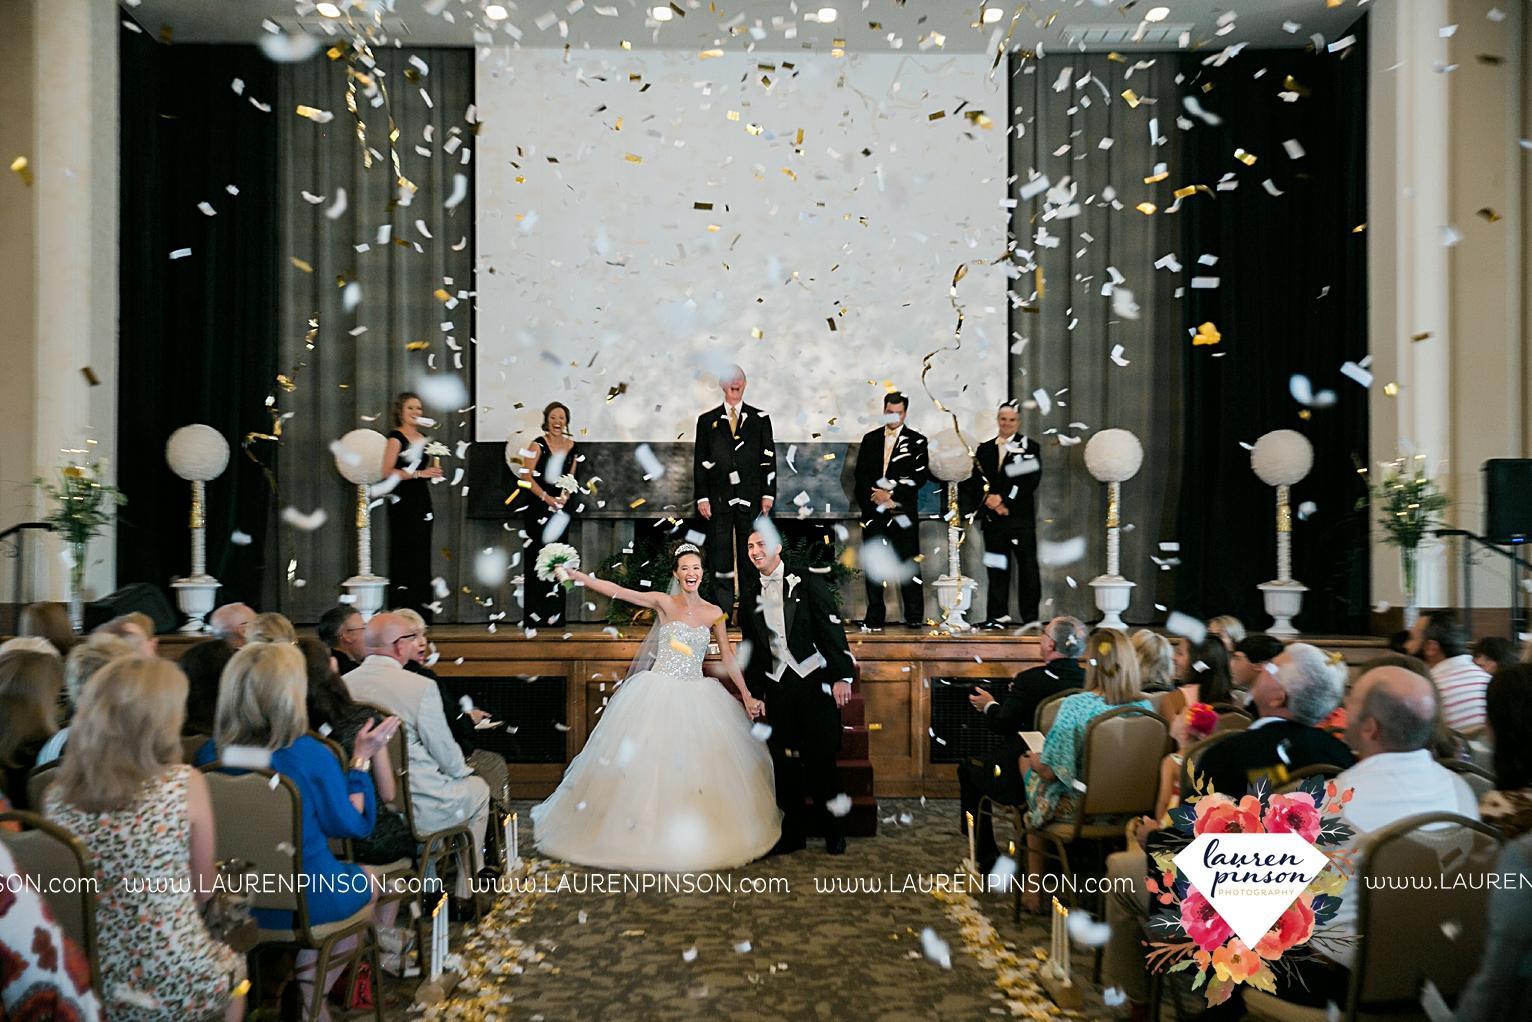 wichita-falls-texas-wedding-photographer-the-forum-by-the-kemp-mayfield-events-ulta-gold-glitter_2869.jpg